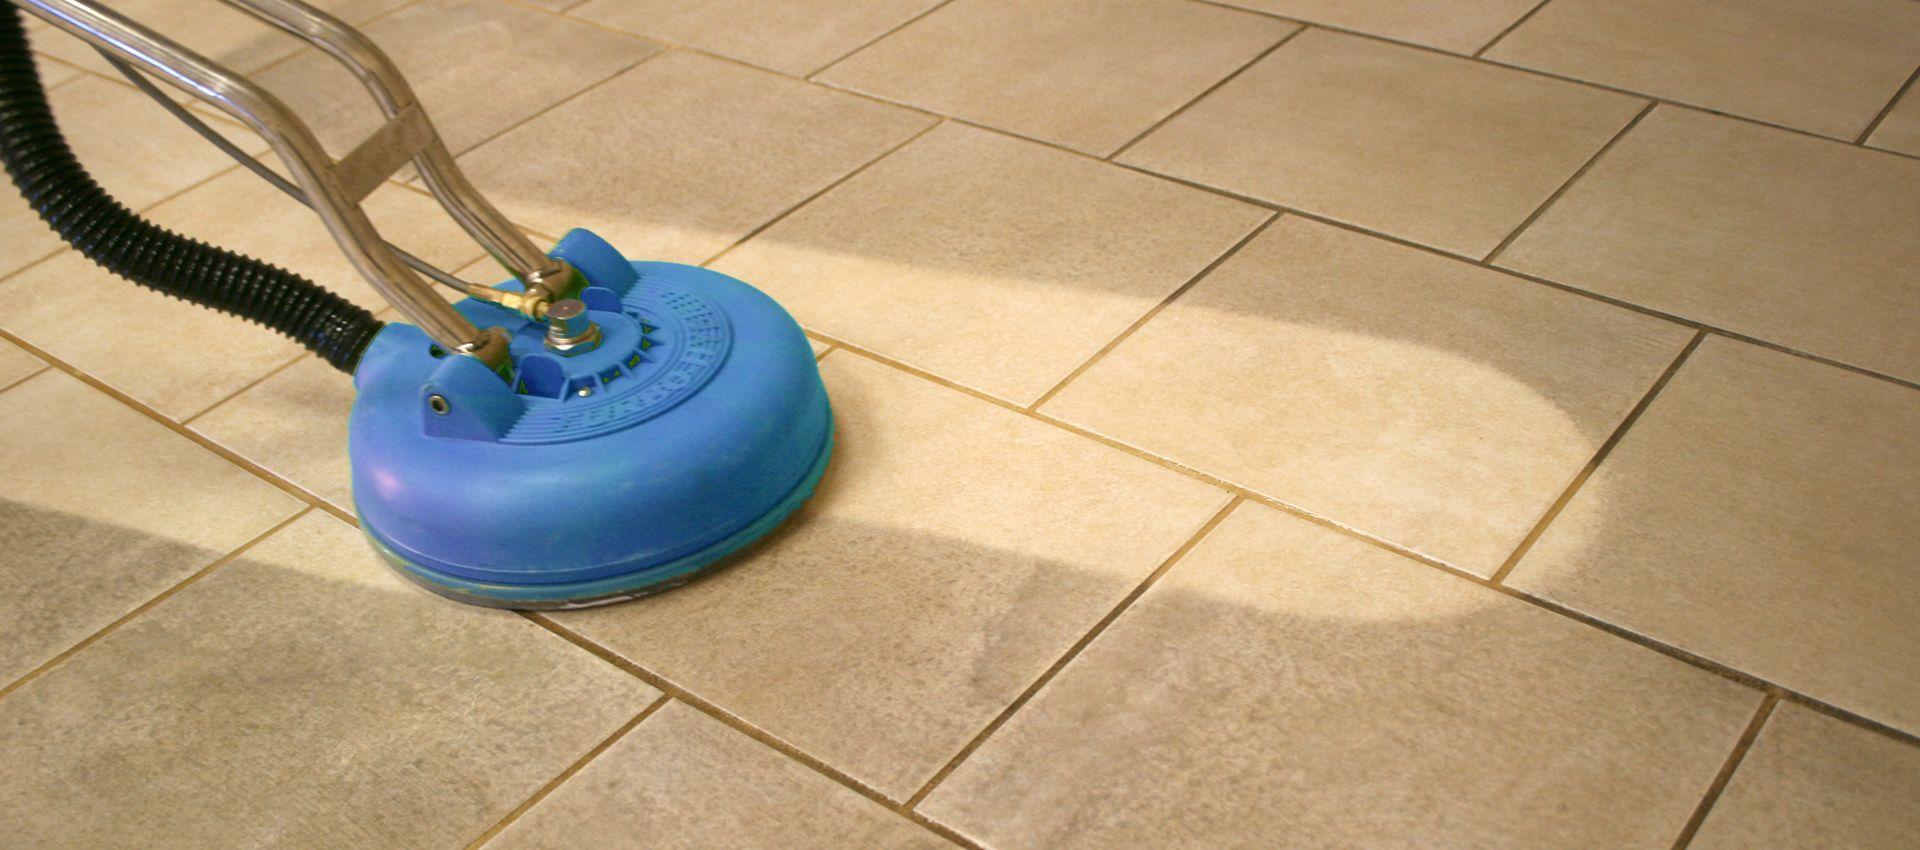 cleaning tile floors ceramic floor